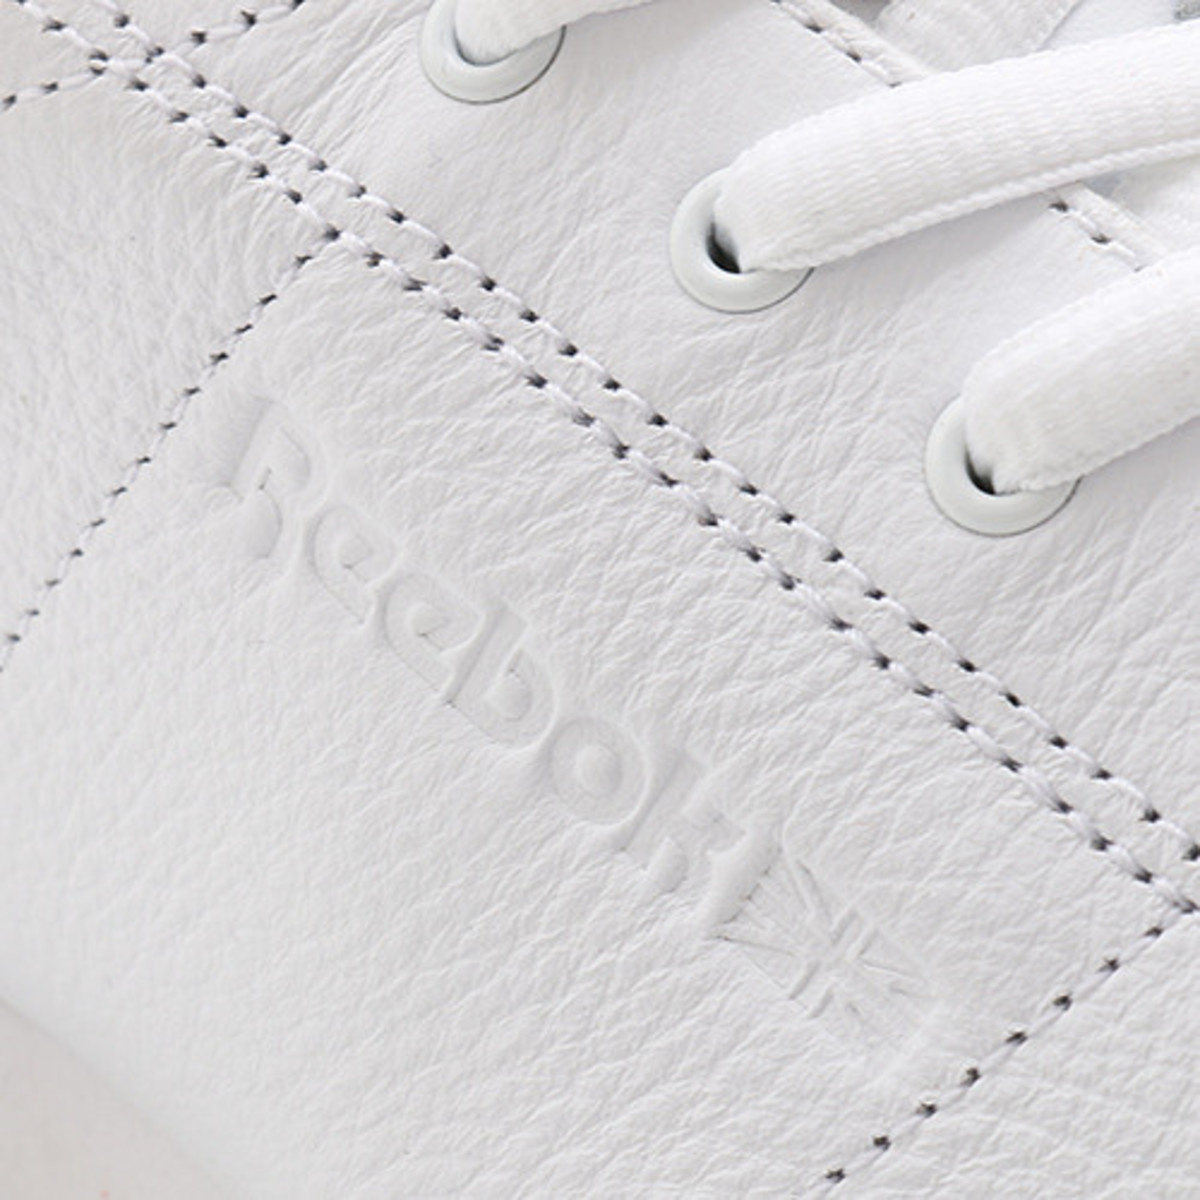 REEBOK CLASSIC X SALONG BETONG NPC II WHITE on Garmentory